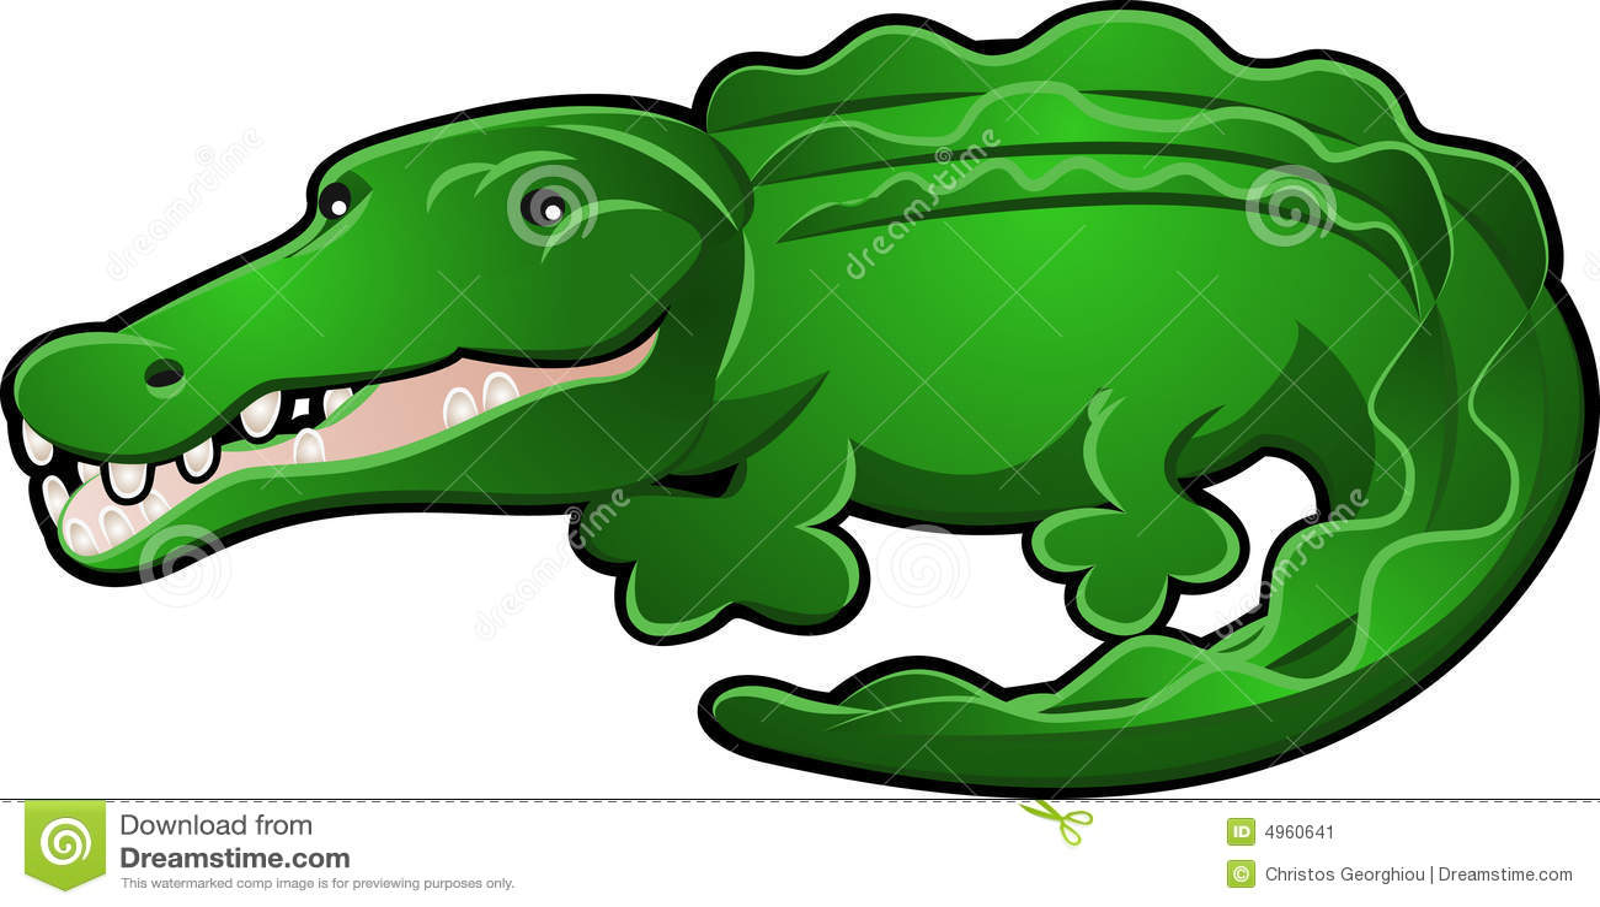 Dessin anim mignon d 39 alligator ou de crocodile illustration de vecteur illustration du - Dessin anime crocodile ...